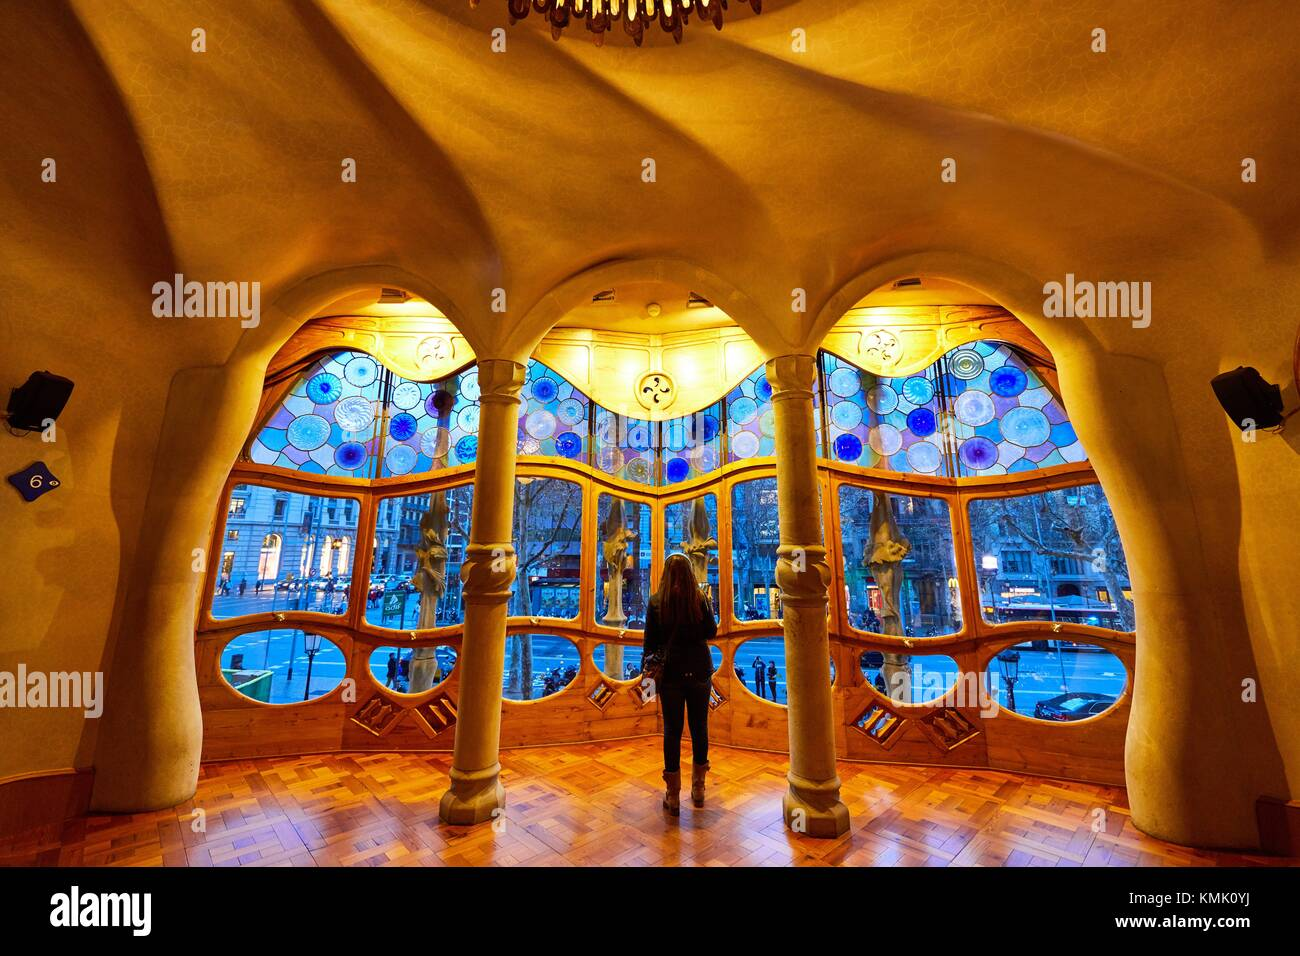 Casa Batlló by Antoni Gaudí architect 1904-1906, Passeig de Gracia, Barcelona, Catalonia, Spain - Stock Image